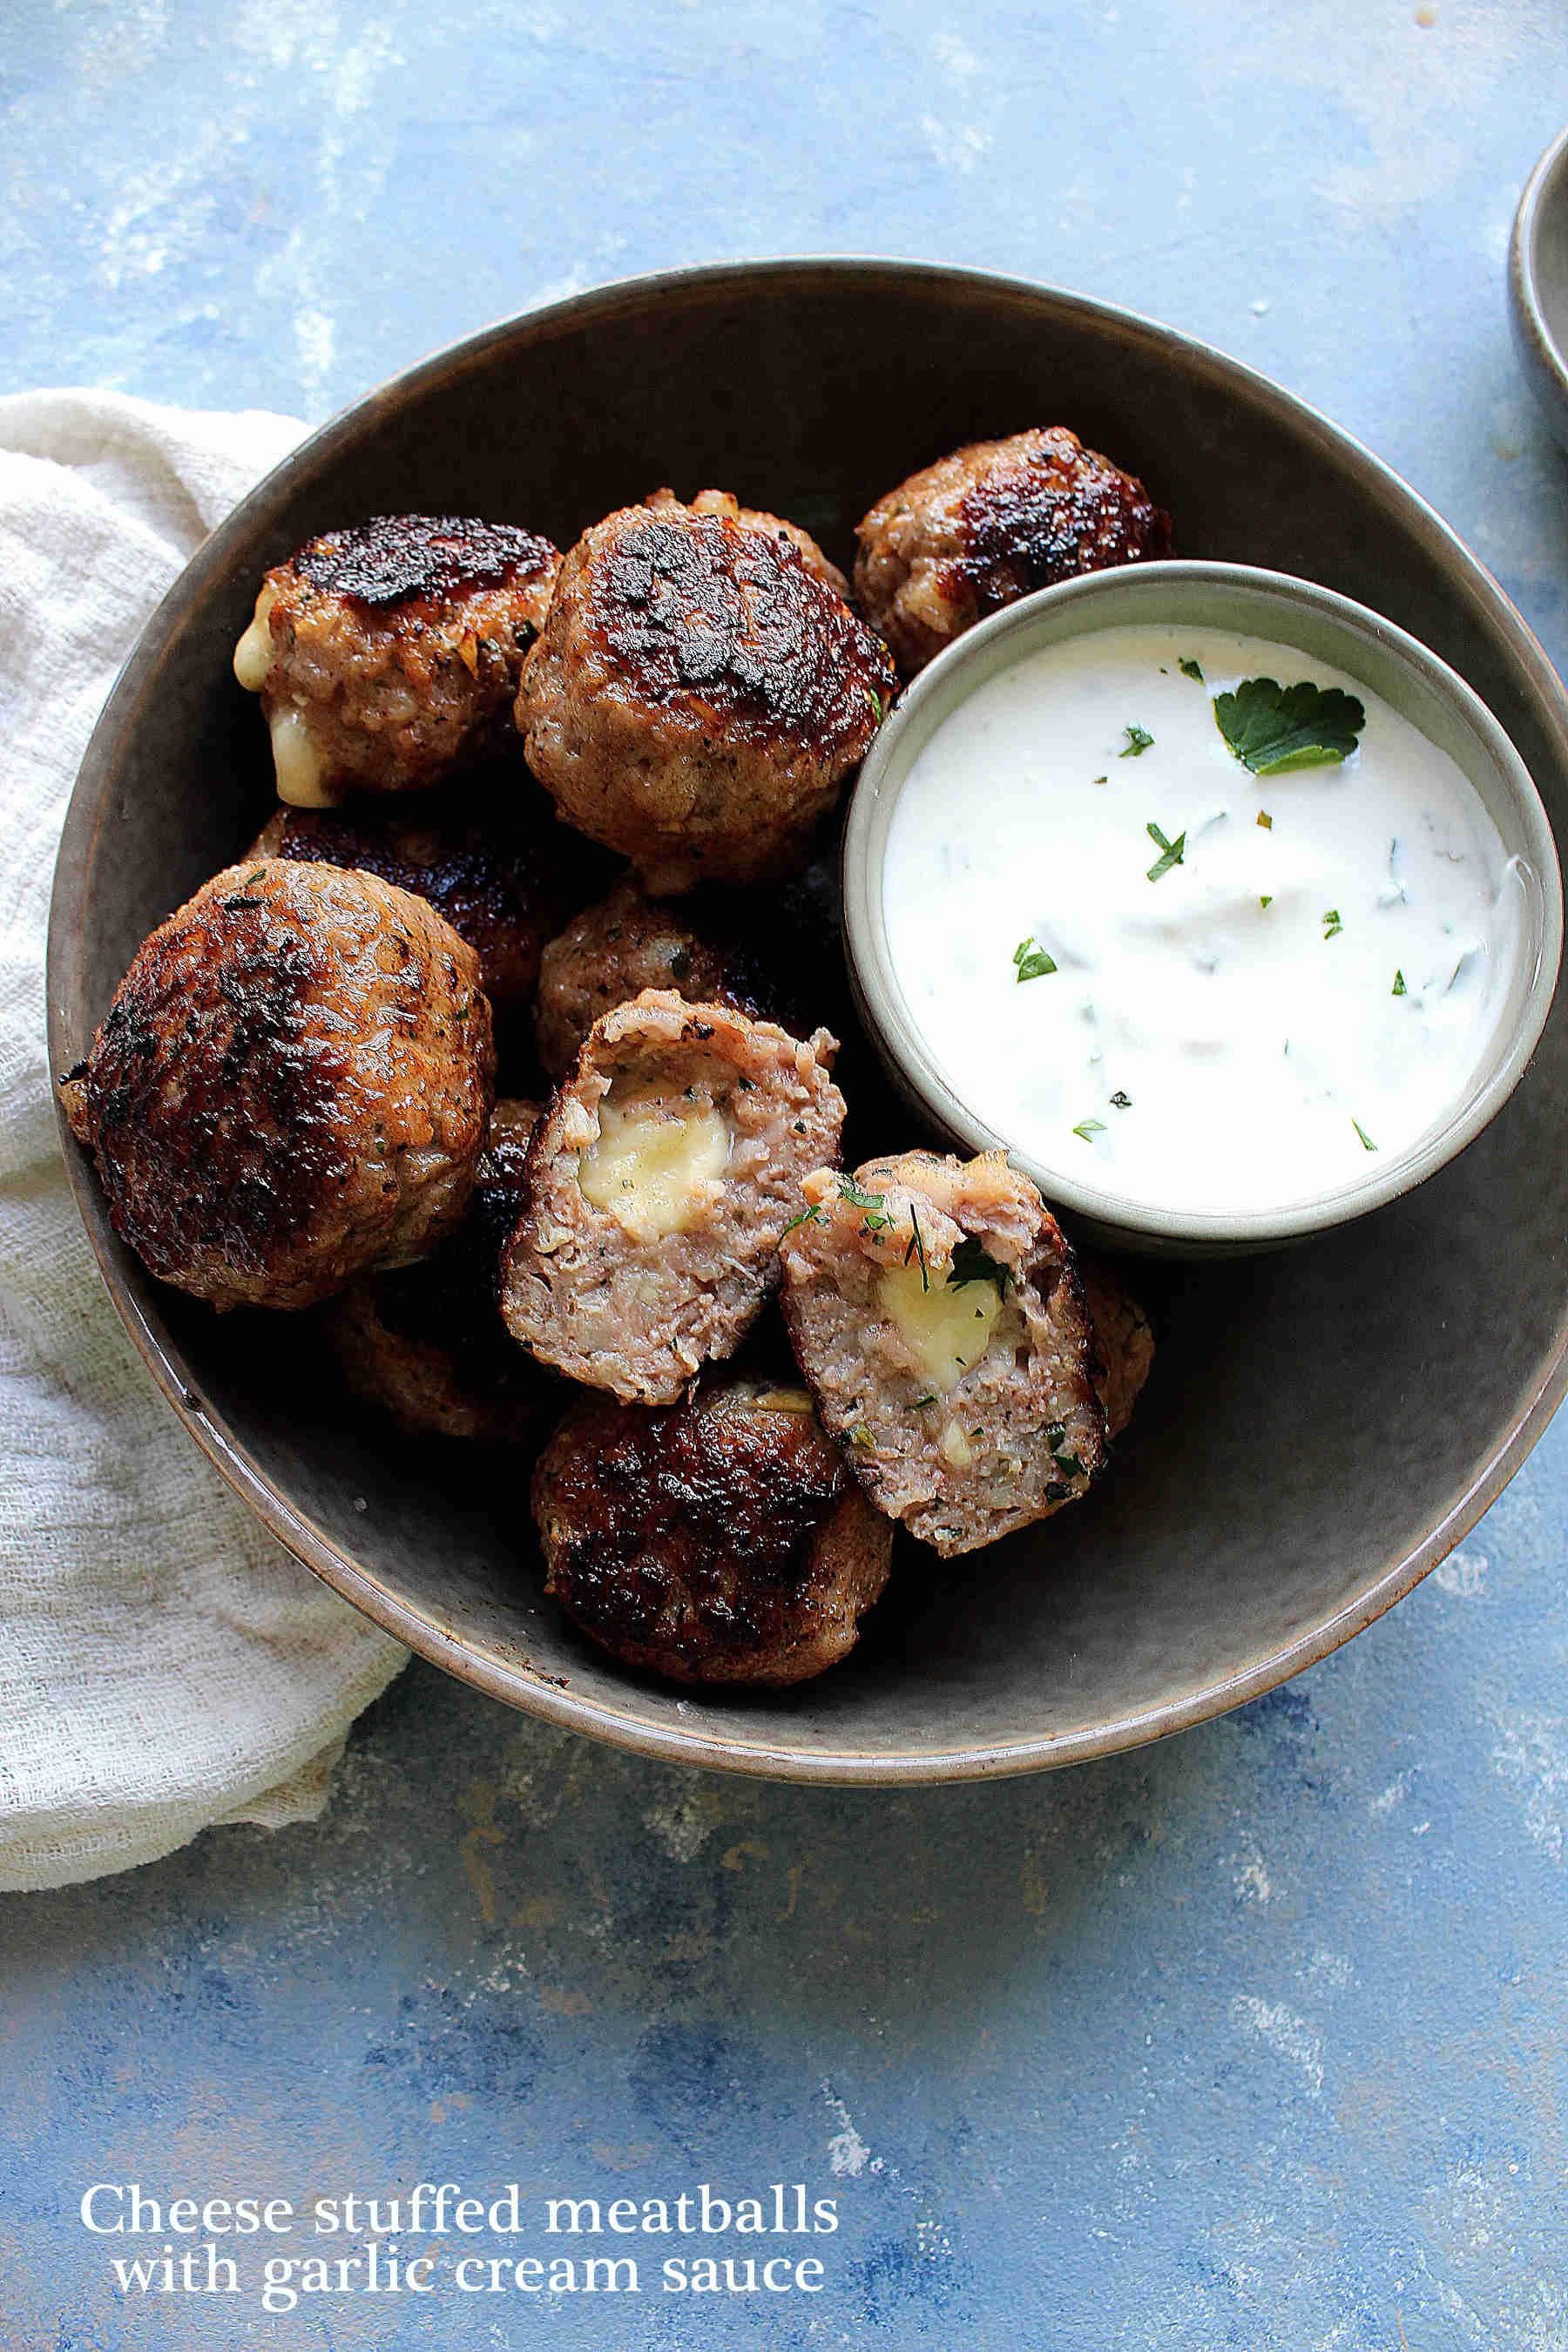 Cheese stuffed meatballs with garlic cream sauce